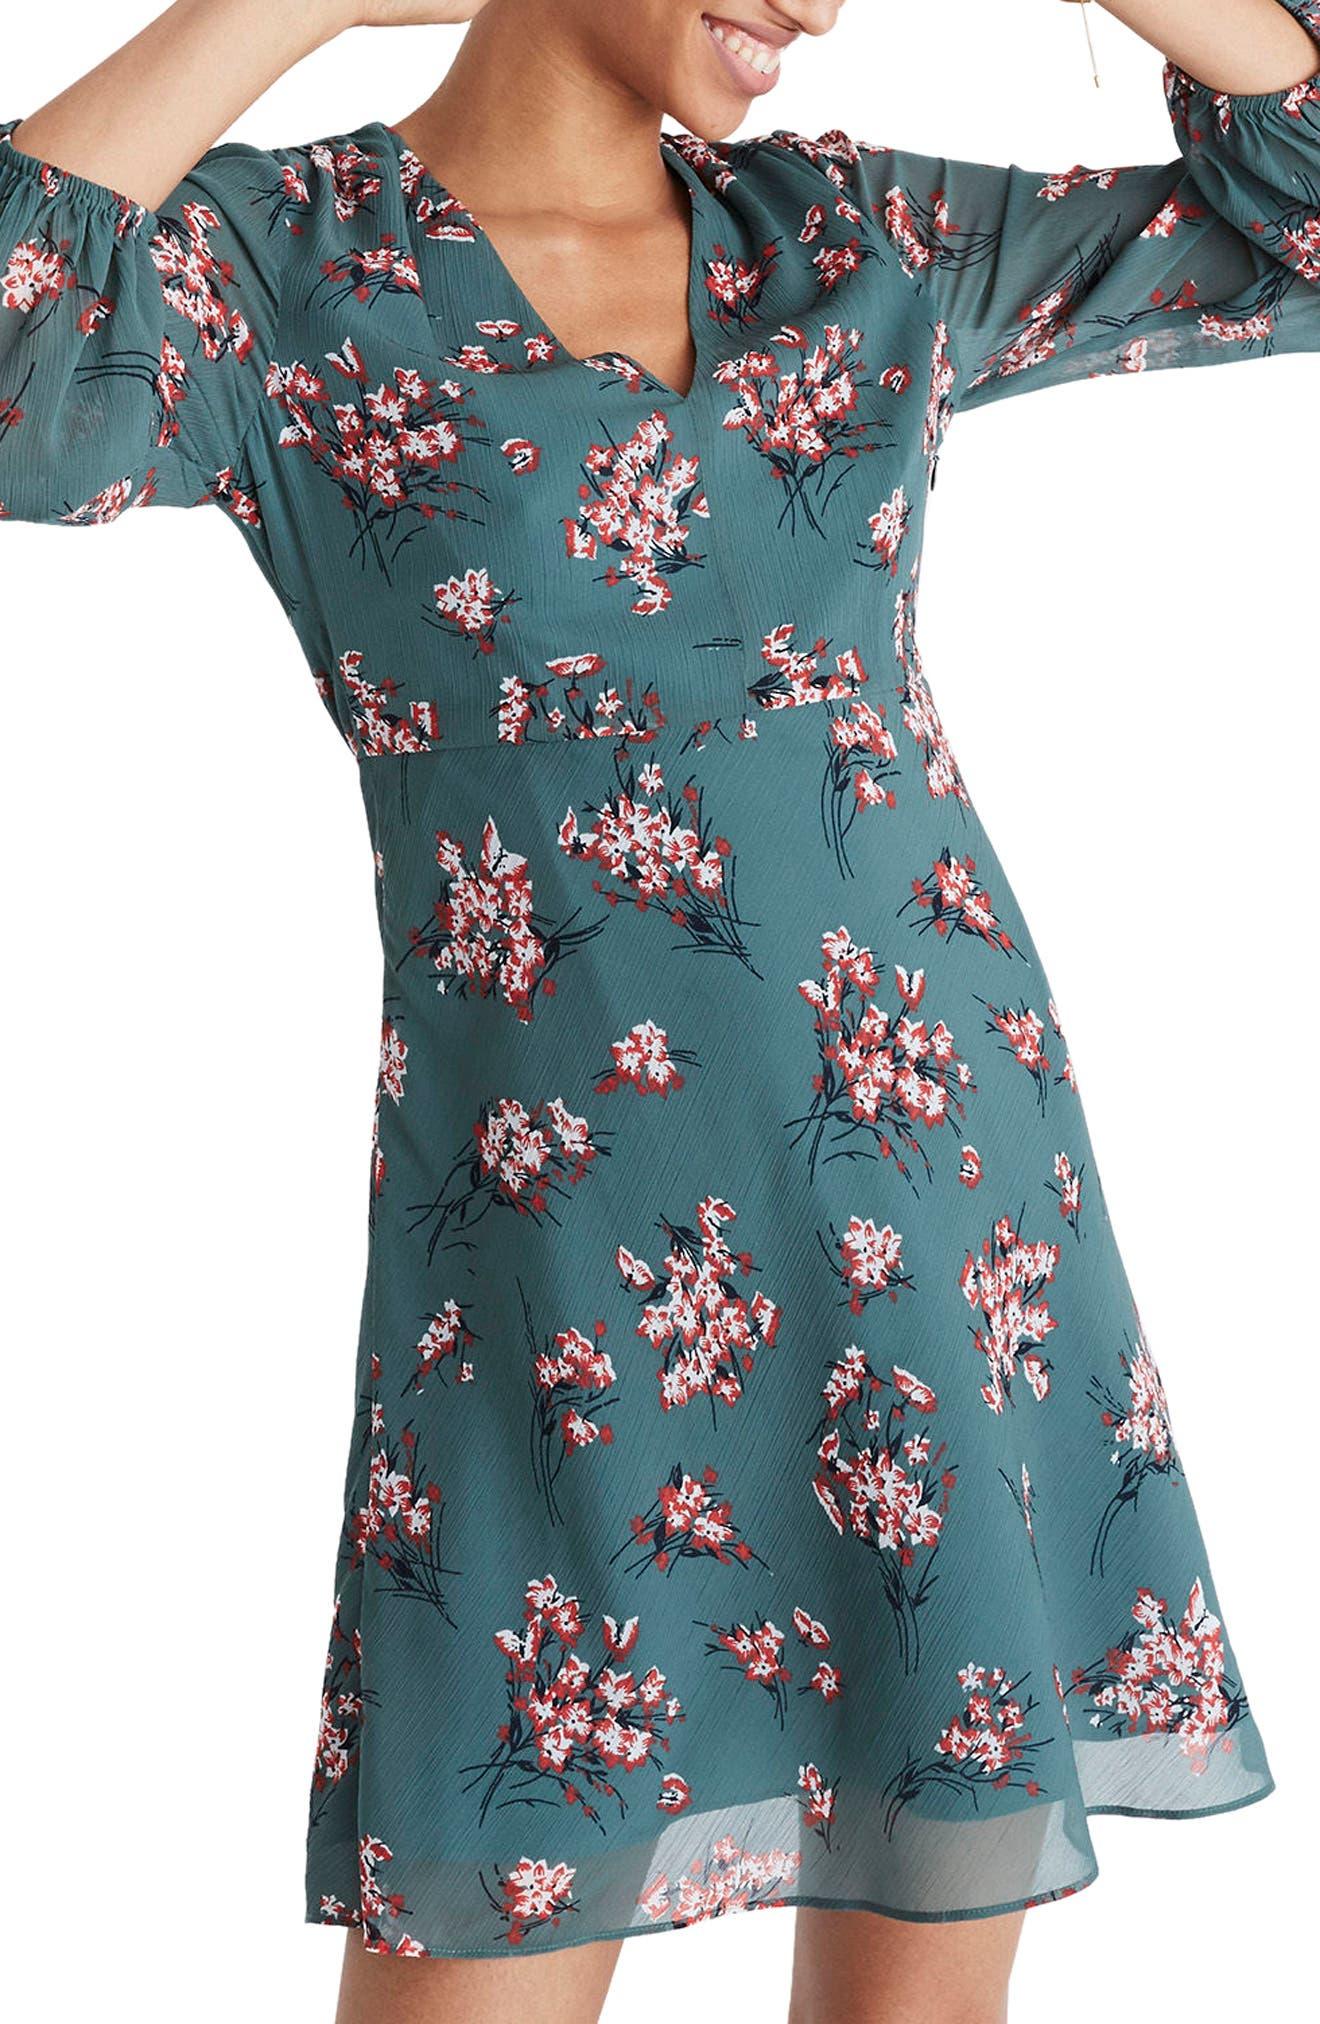 Marguerite Swing Dress,                             Main thumbnail 1, color,                             300